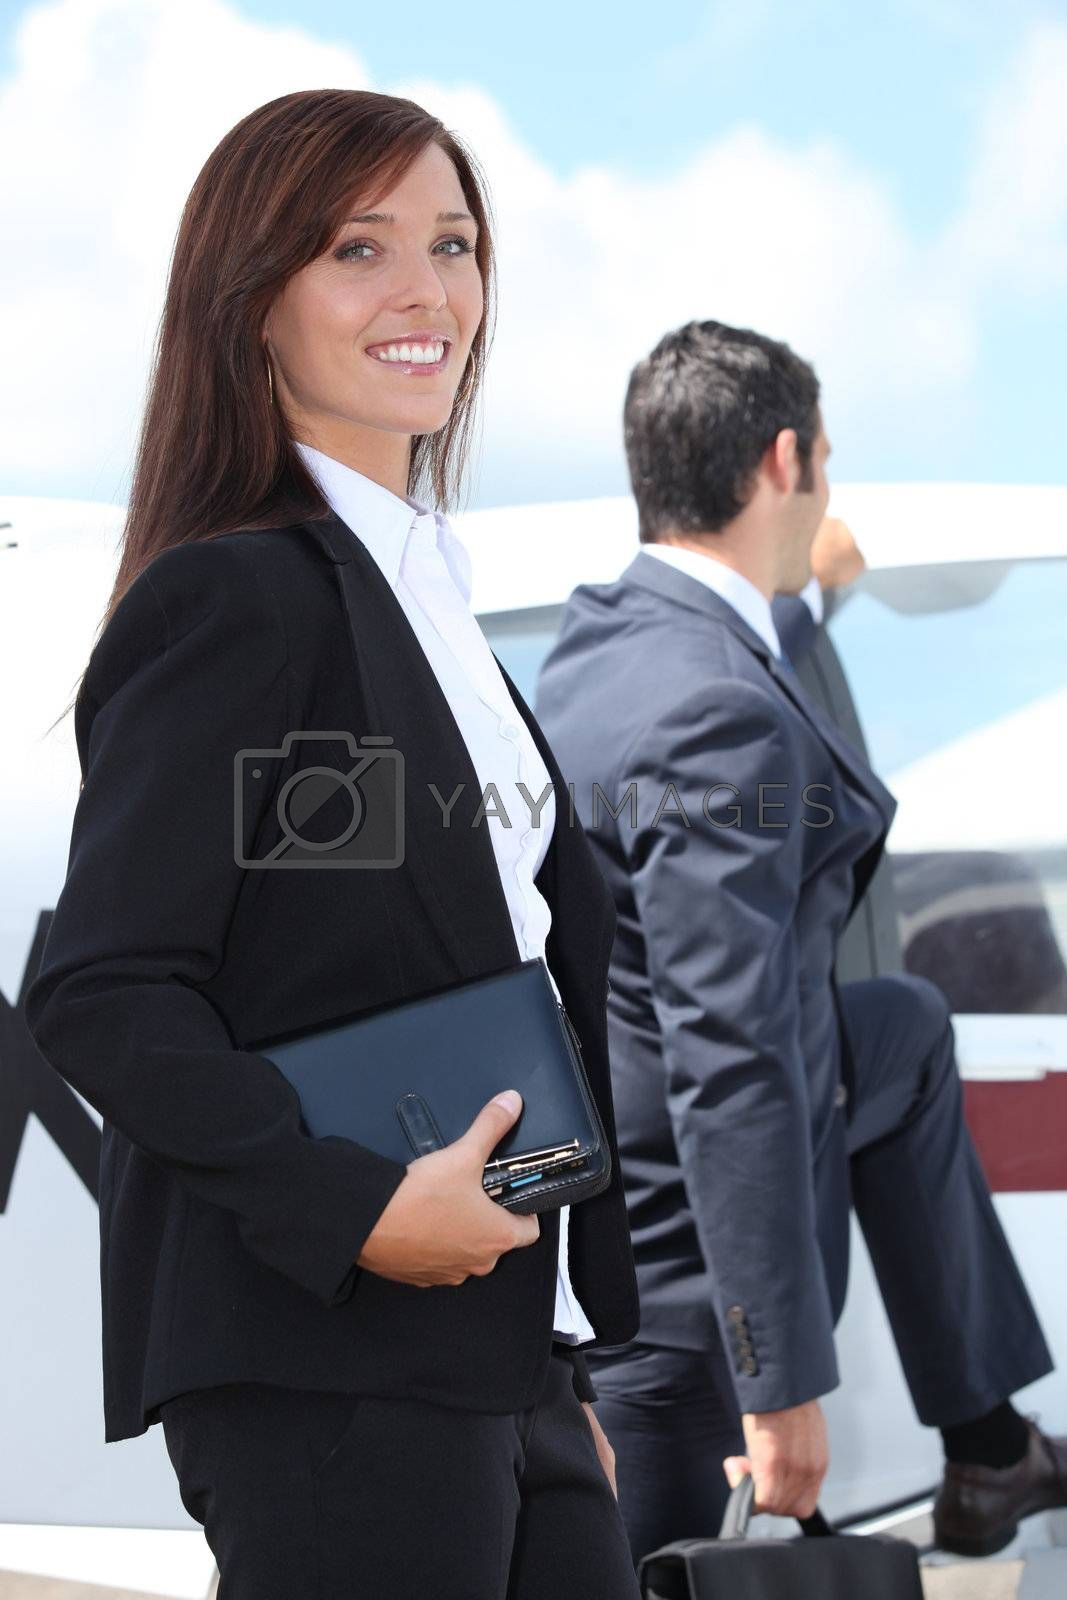 Couple boarding a light aircraft